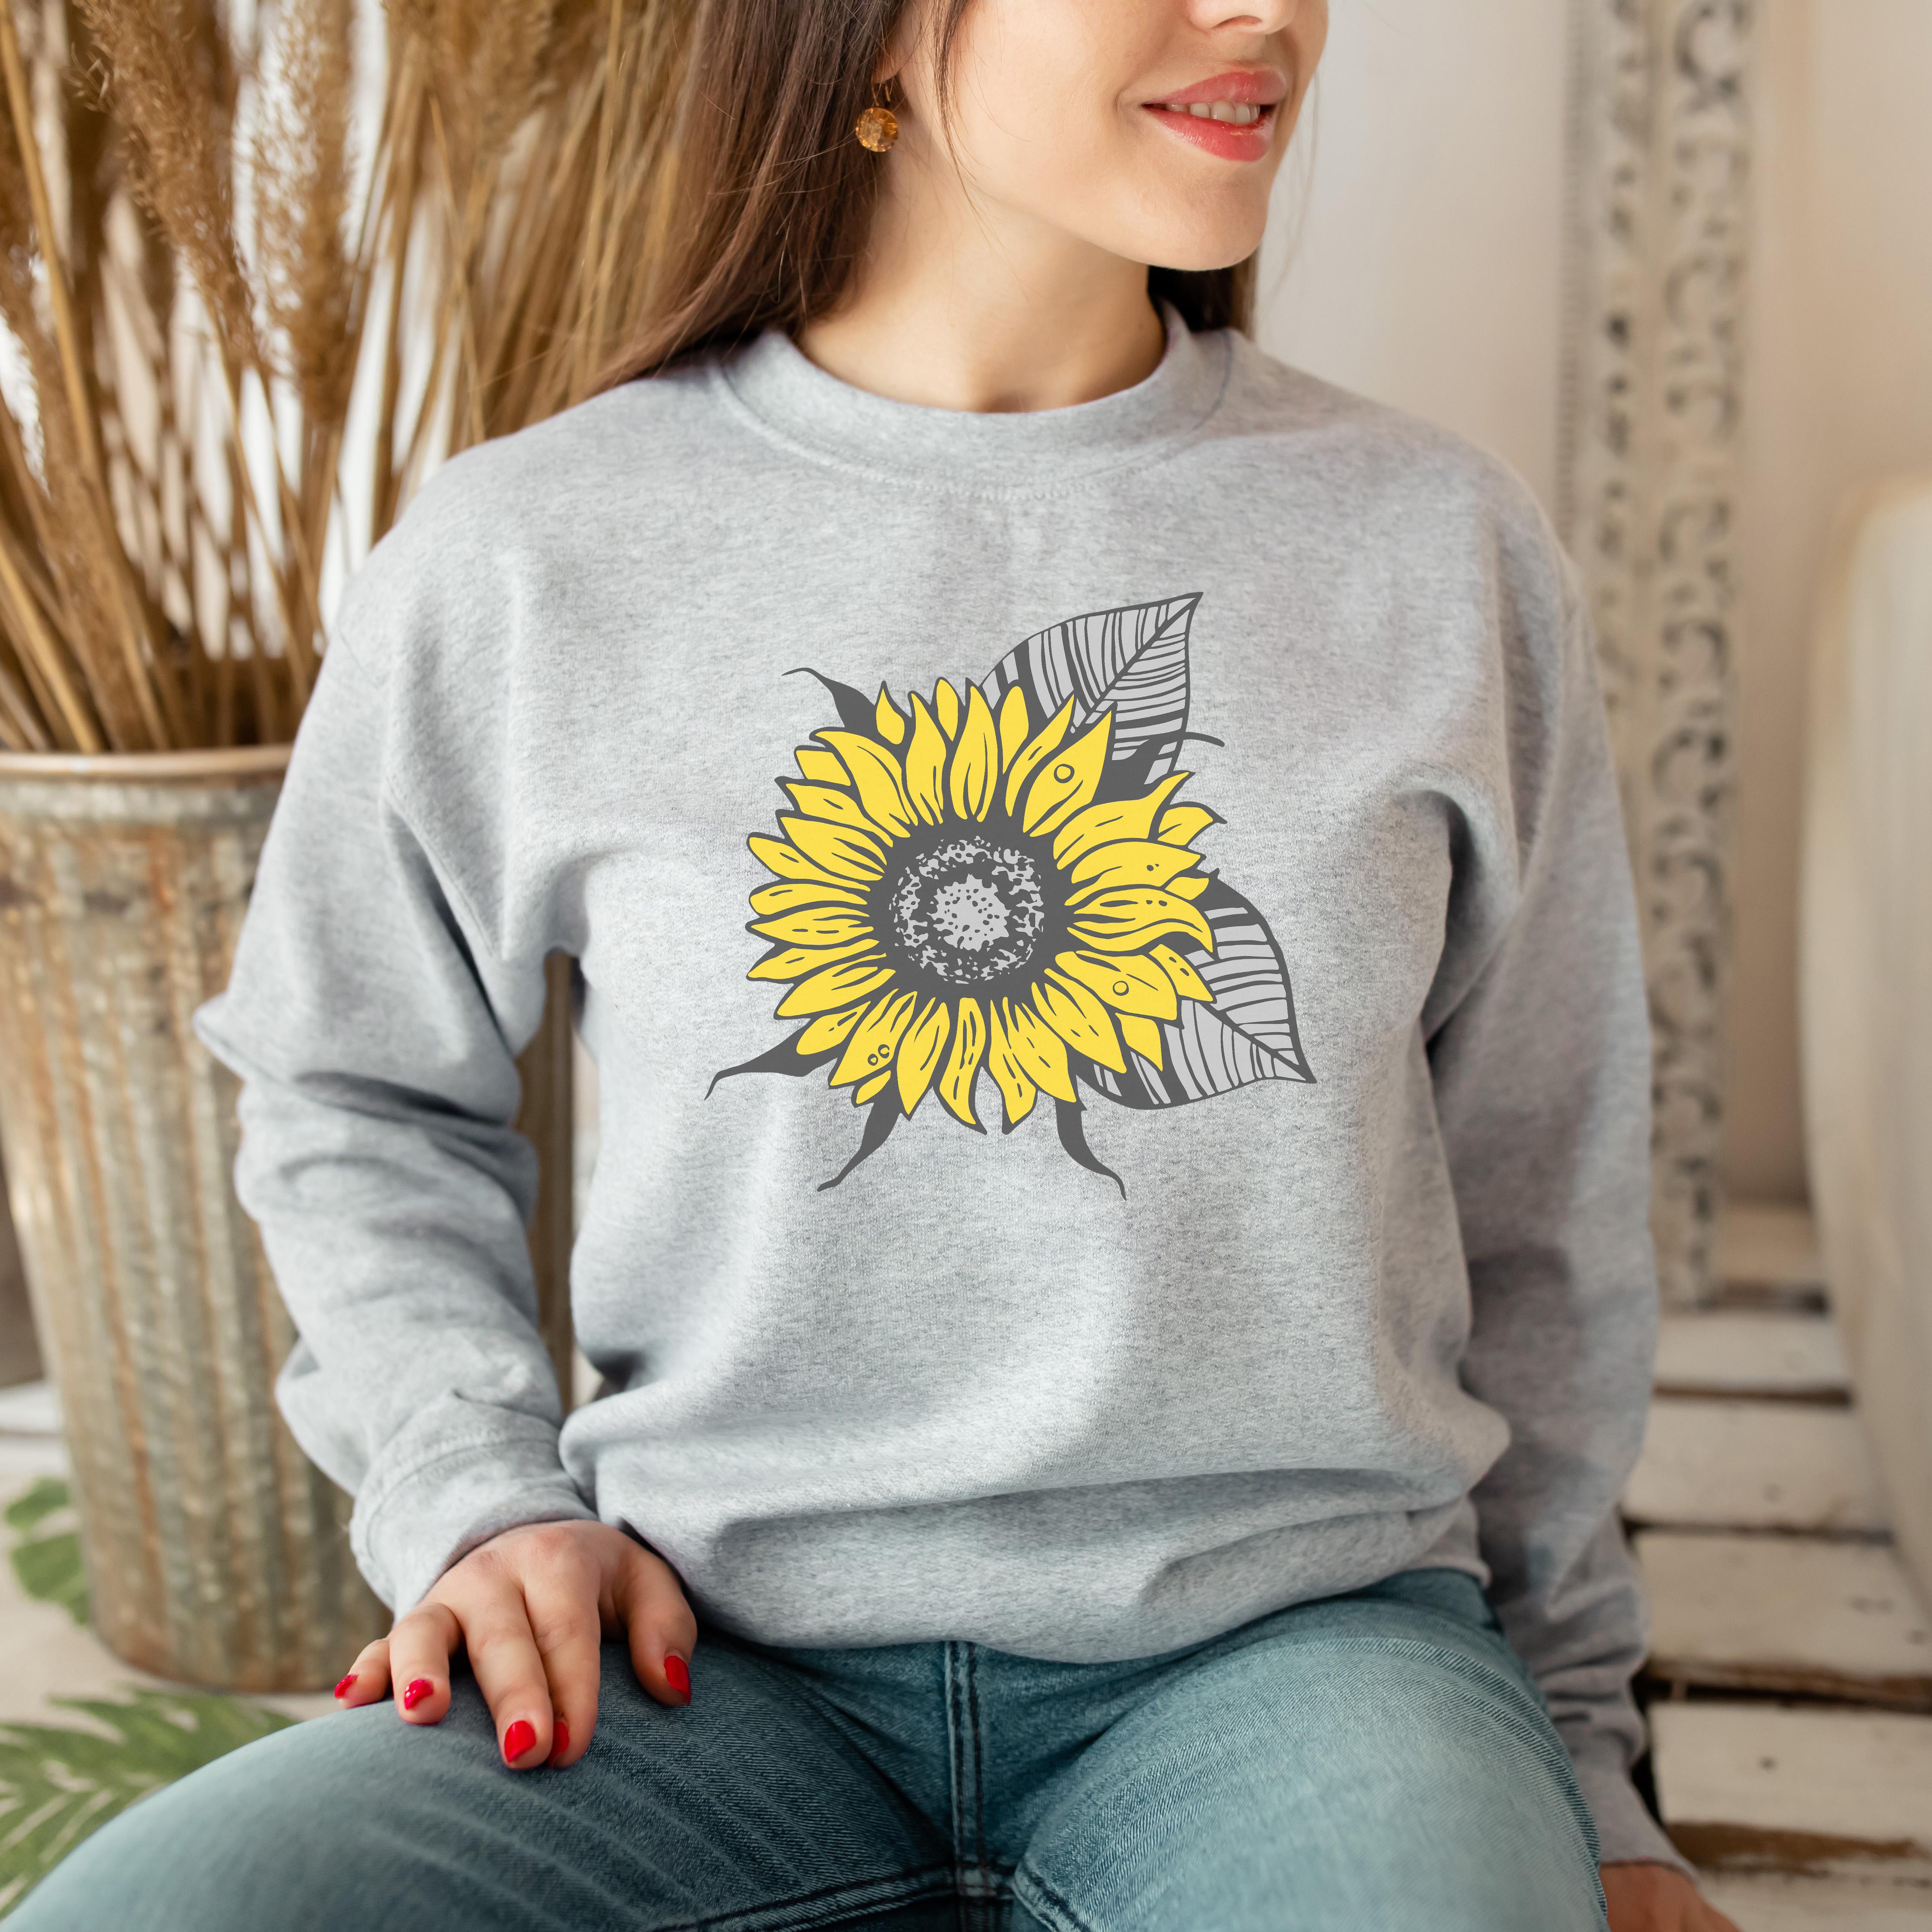 Rustic Sunflower Sweatshirt